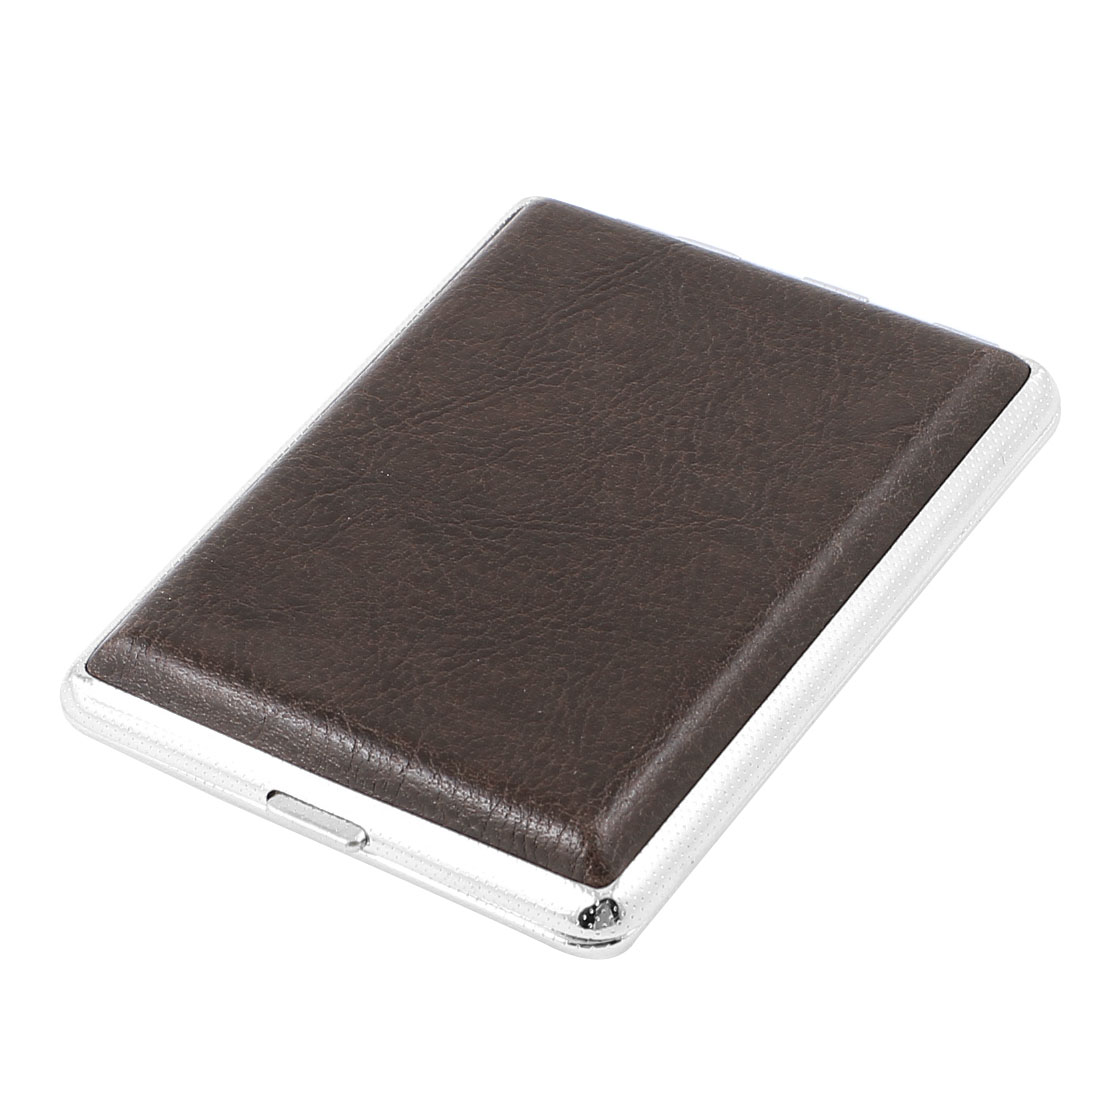 9cm x7cm Two Sides Crocodile Pattern Faux Leather 16 Cigarettes Box Case Storage Chocolate Color